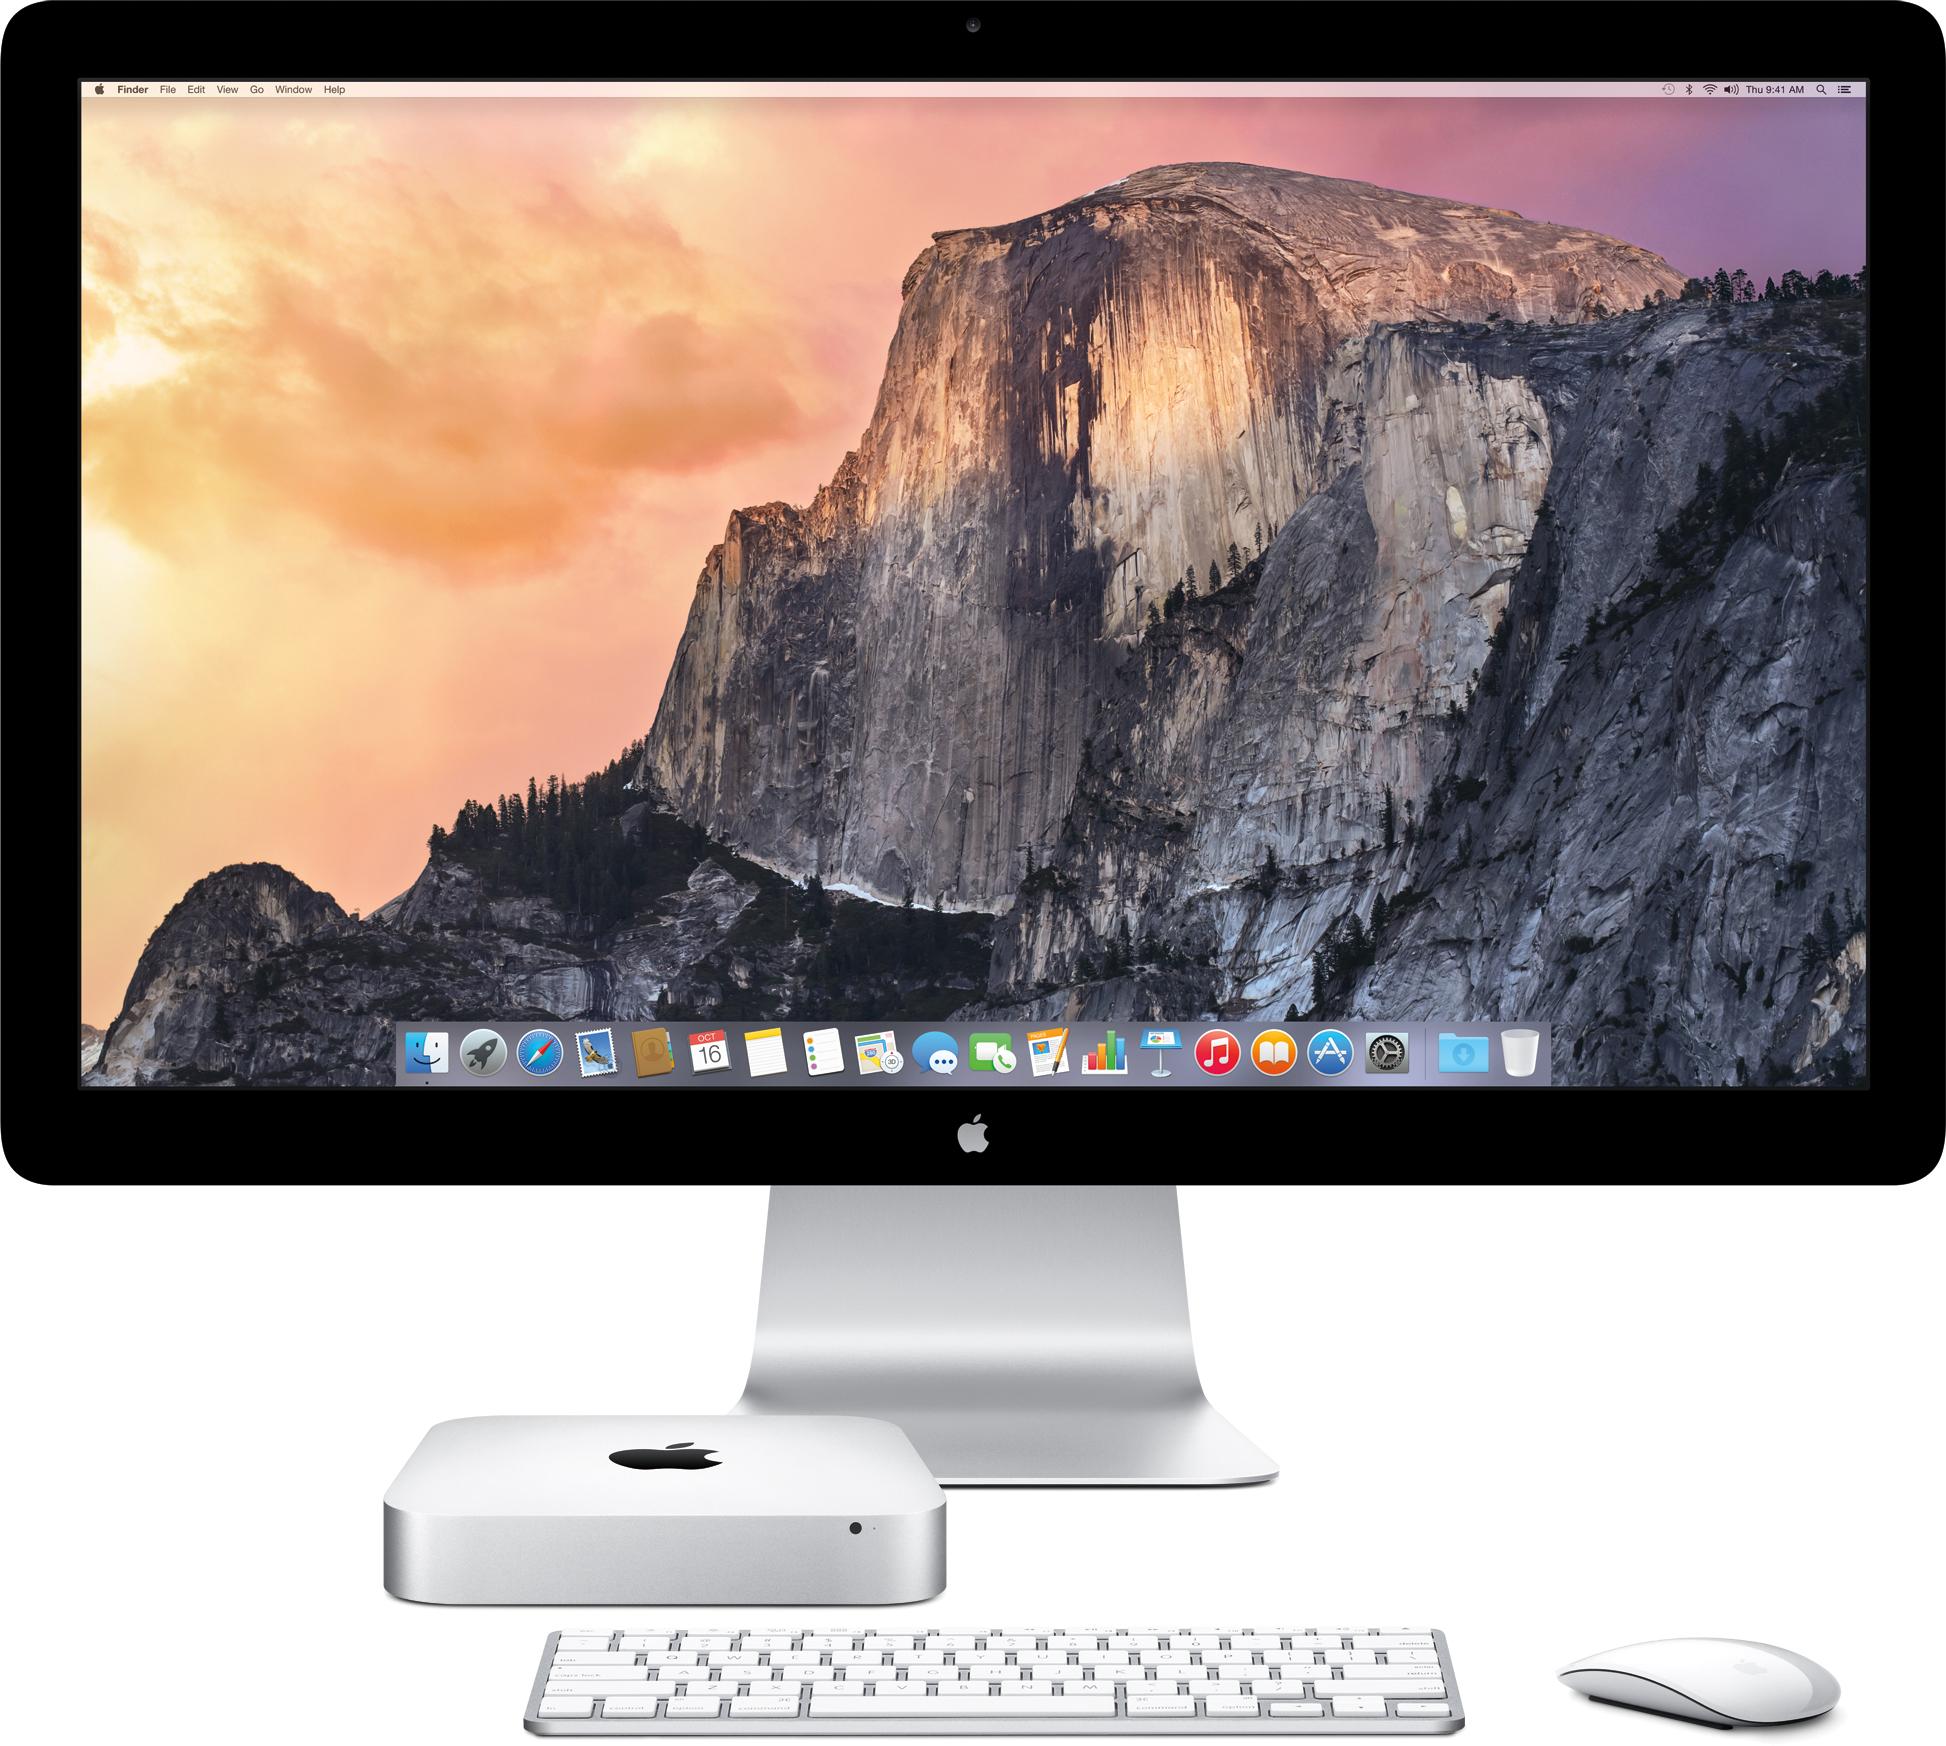 Mini Mac baru dari depan dengan Thunderbolt Display, keyboard, dan mouse